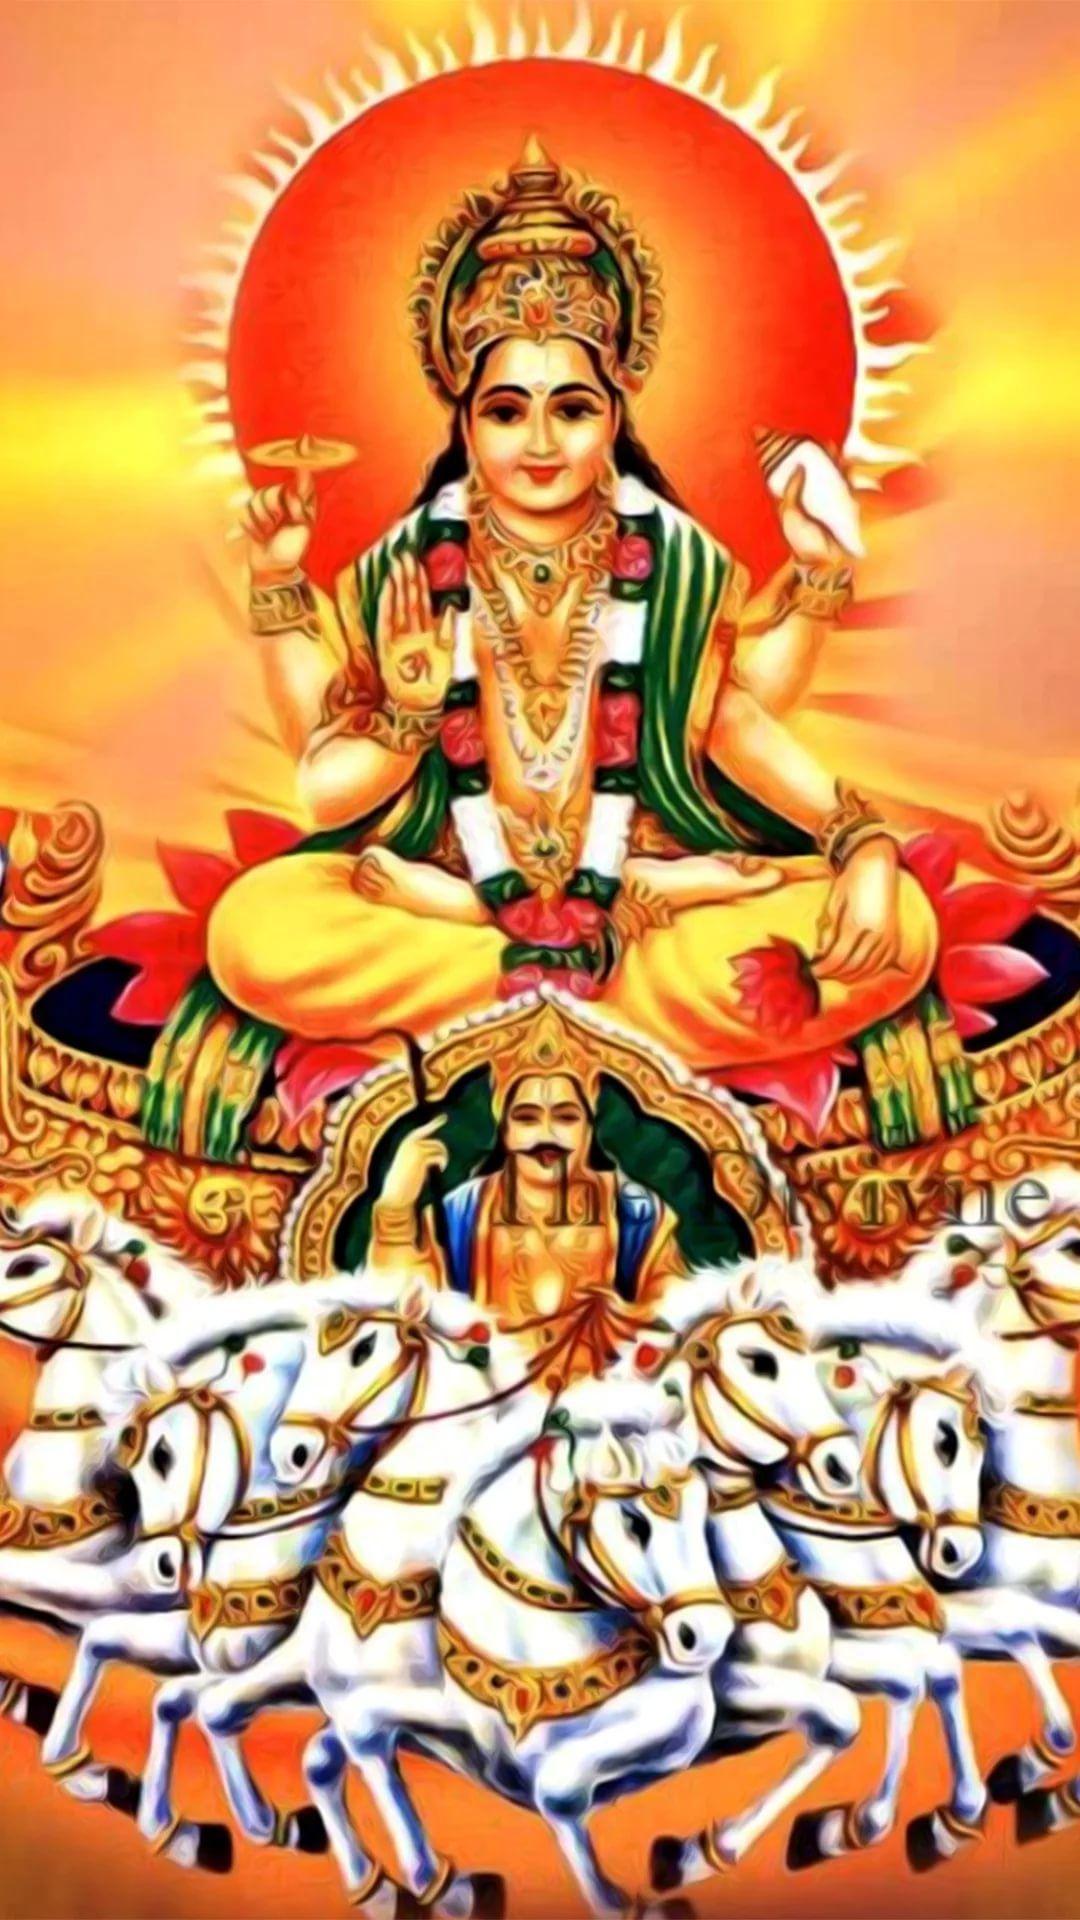 Om Mantra iPhone Wallpaper